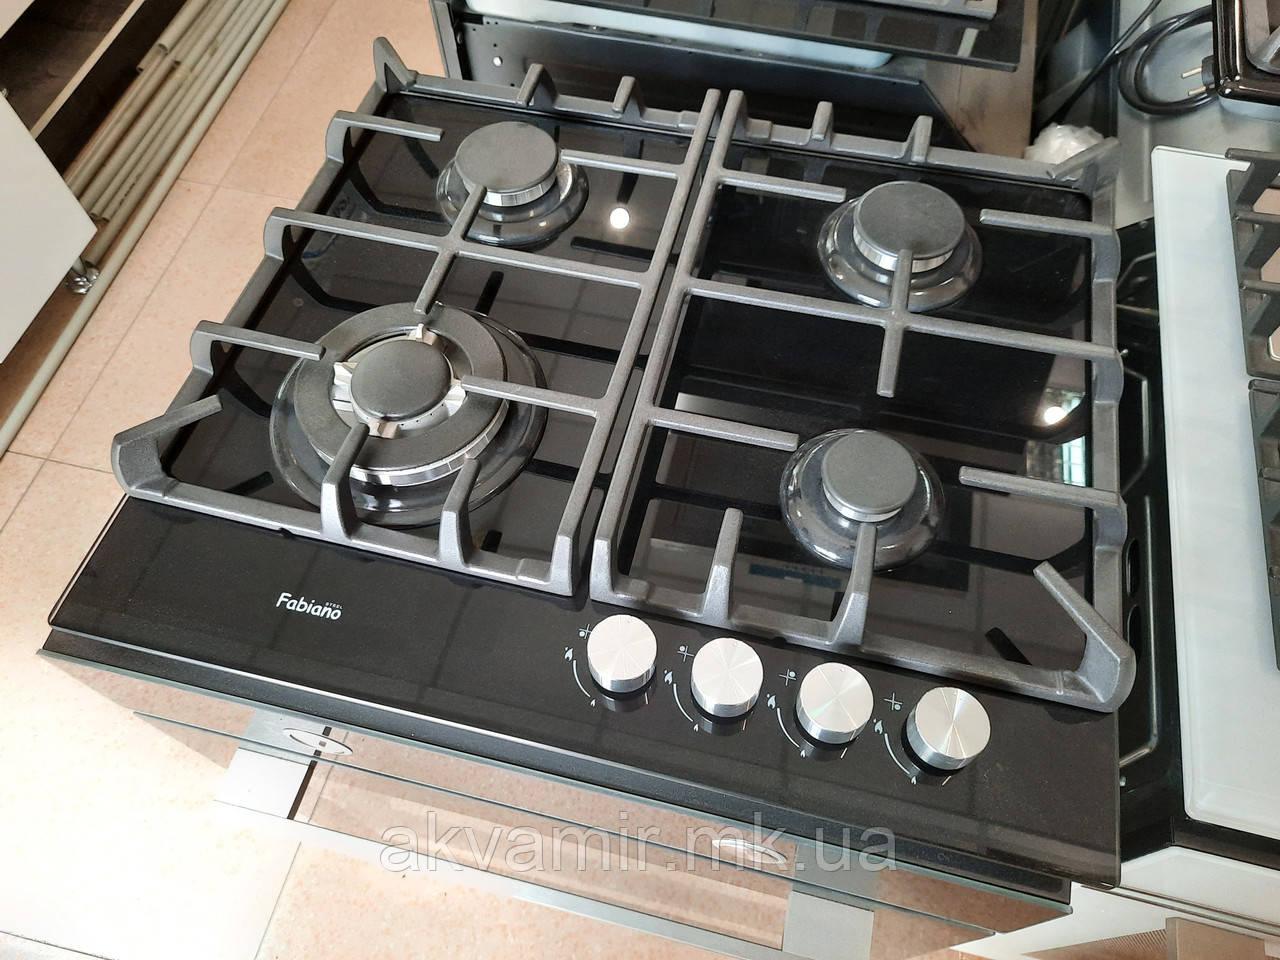 Варильна панель Fabiano FHG 10-44 VGH-T Black Glass (чорне скло) газова